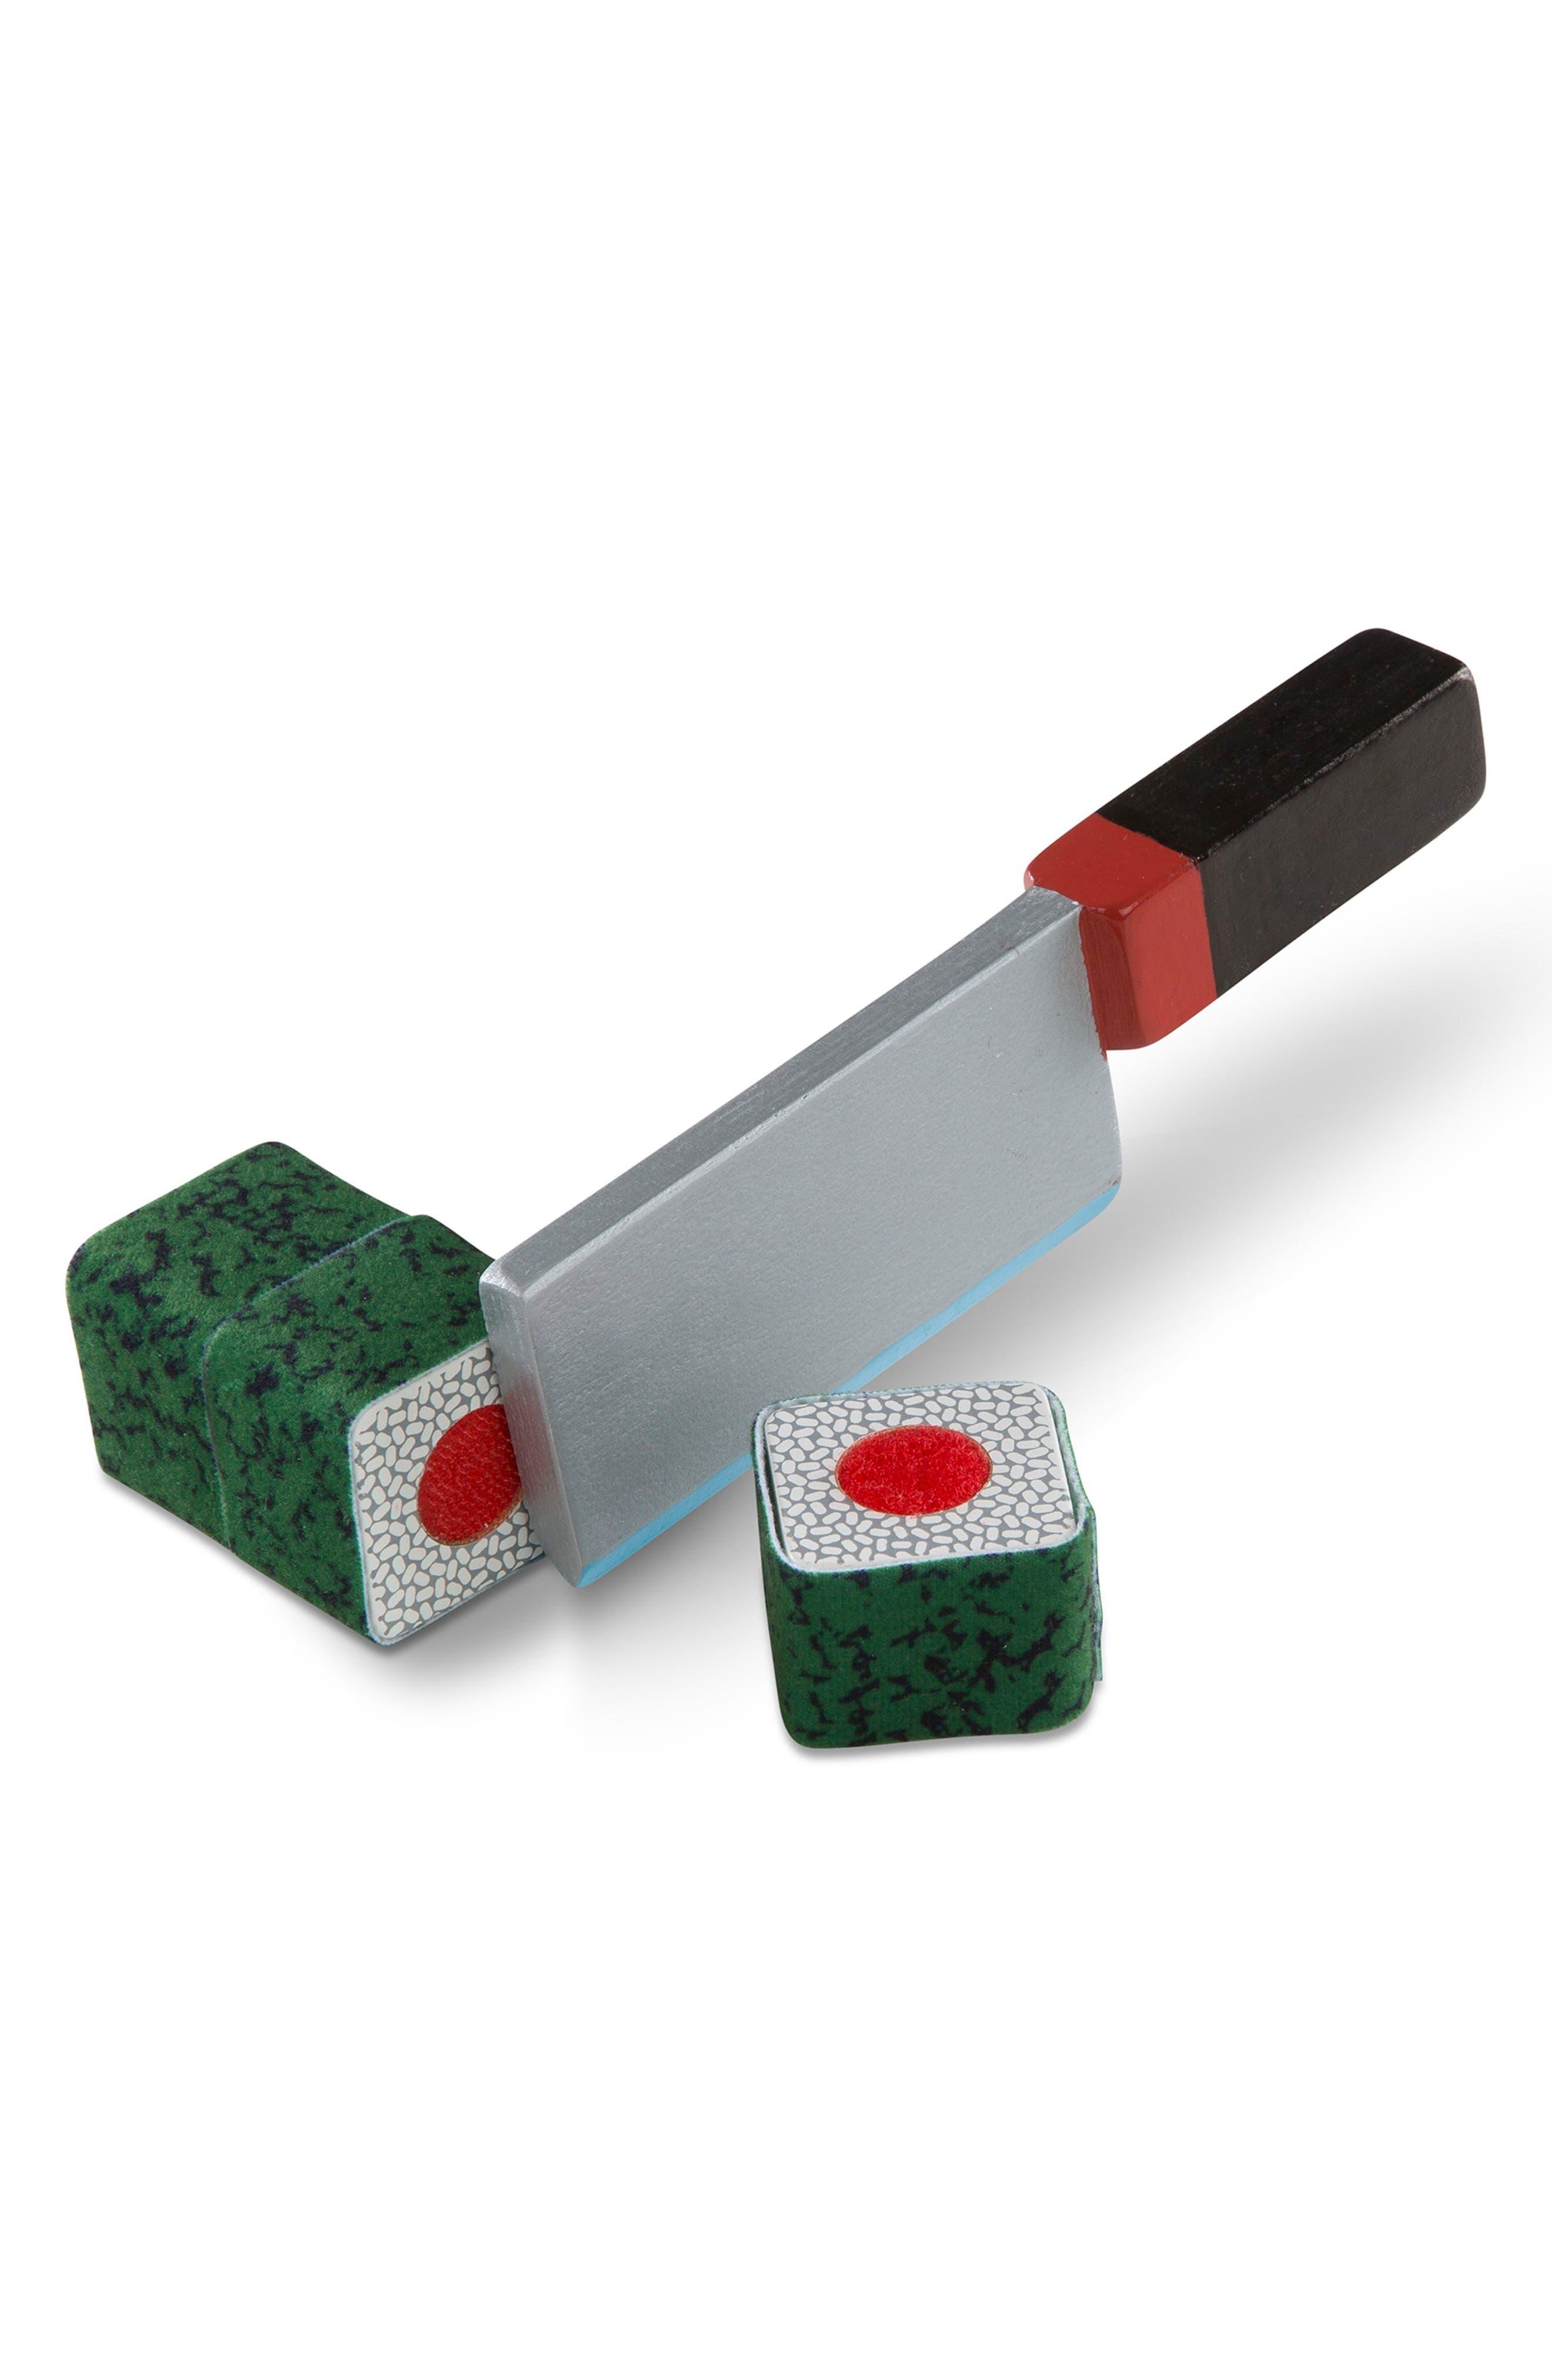 46-Piece Roll Wrap Slice Sushi Making Play Set,                             Alternate thumbnail 3, color,                             MULTI